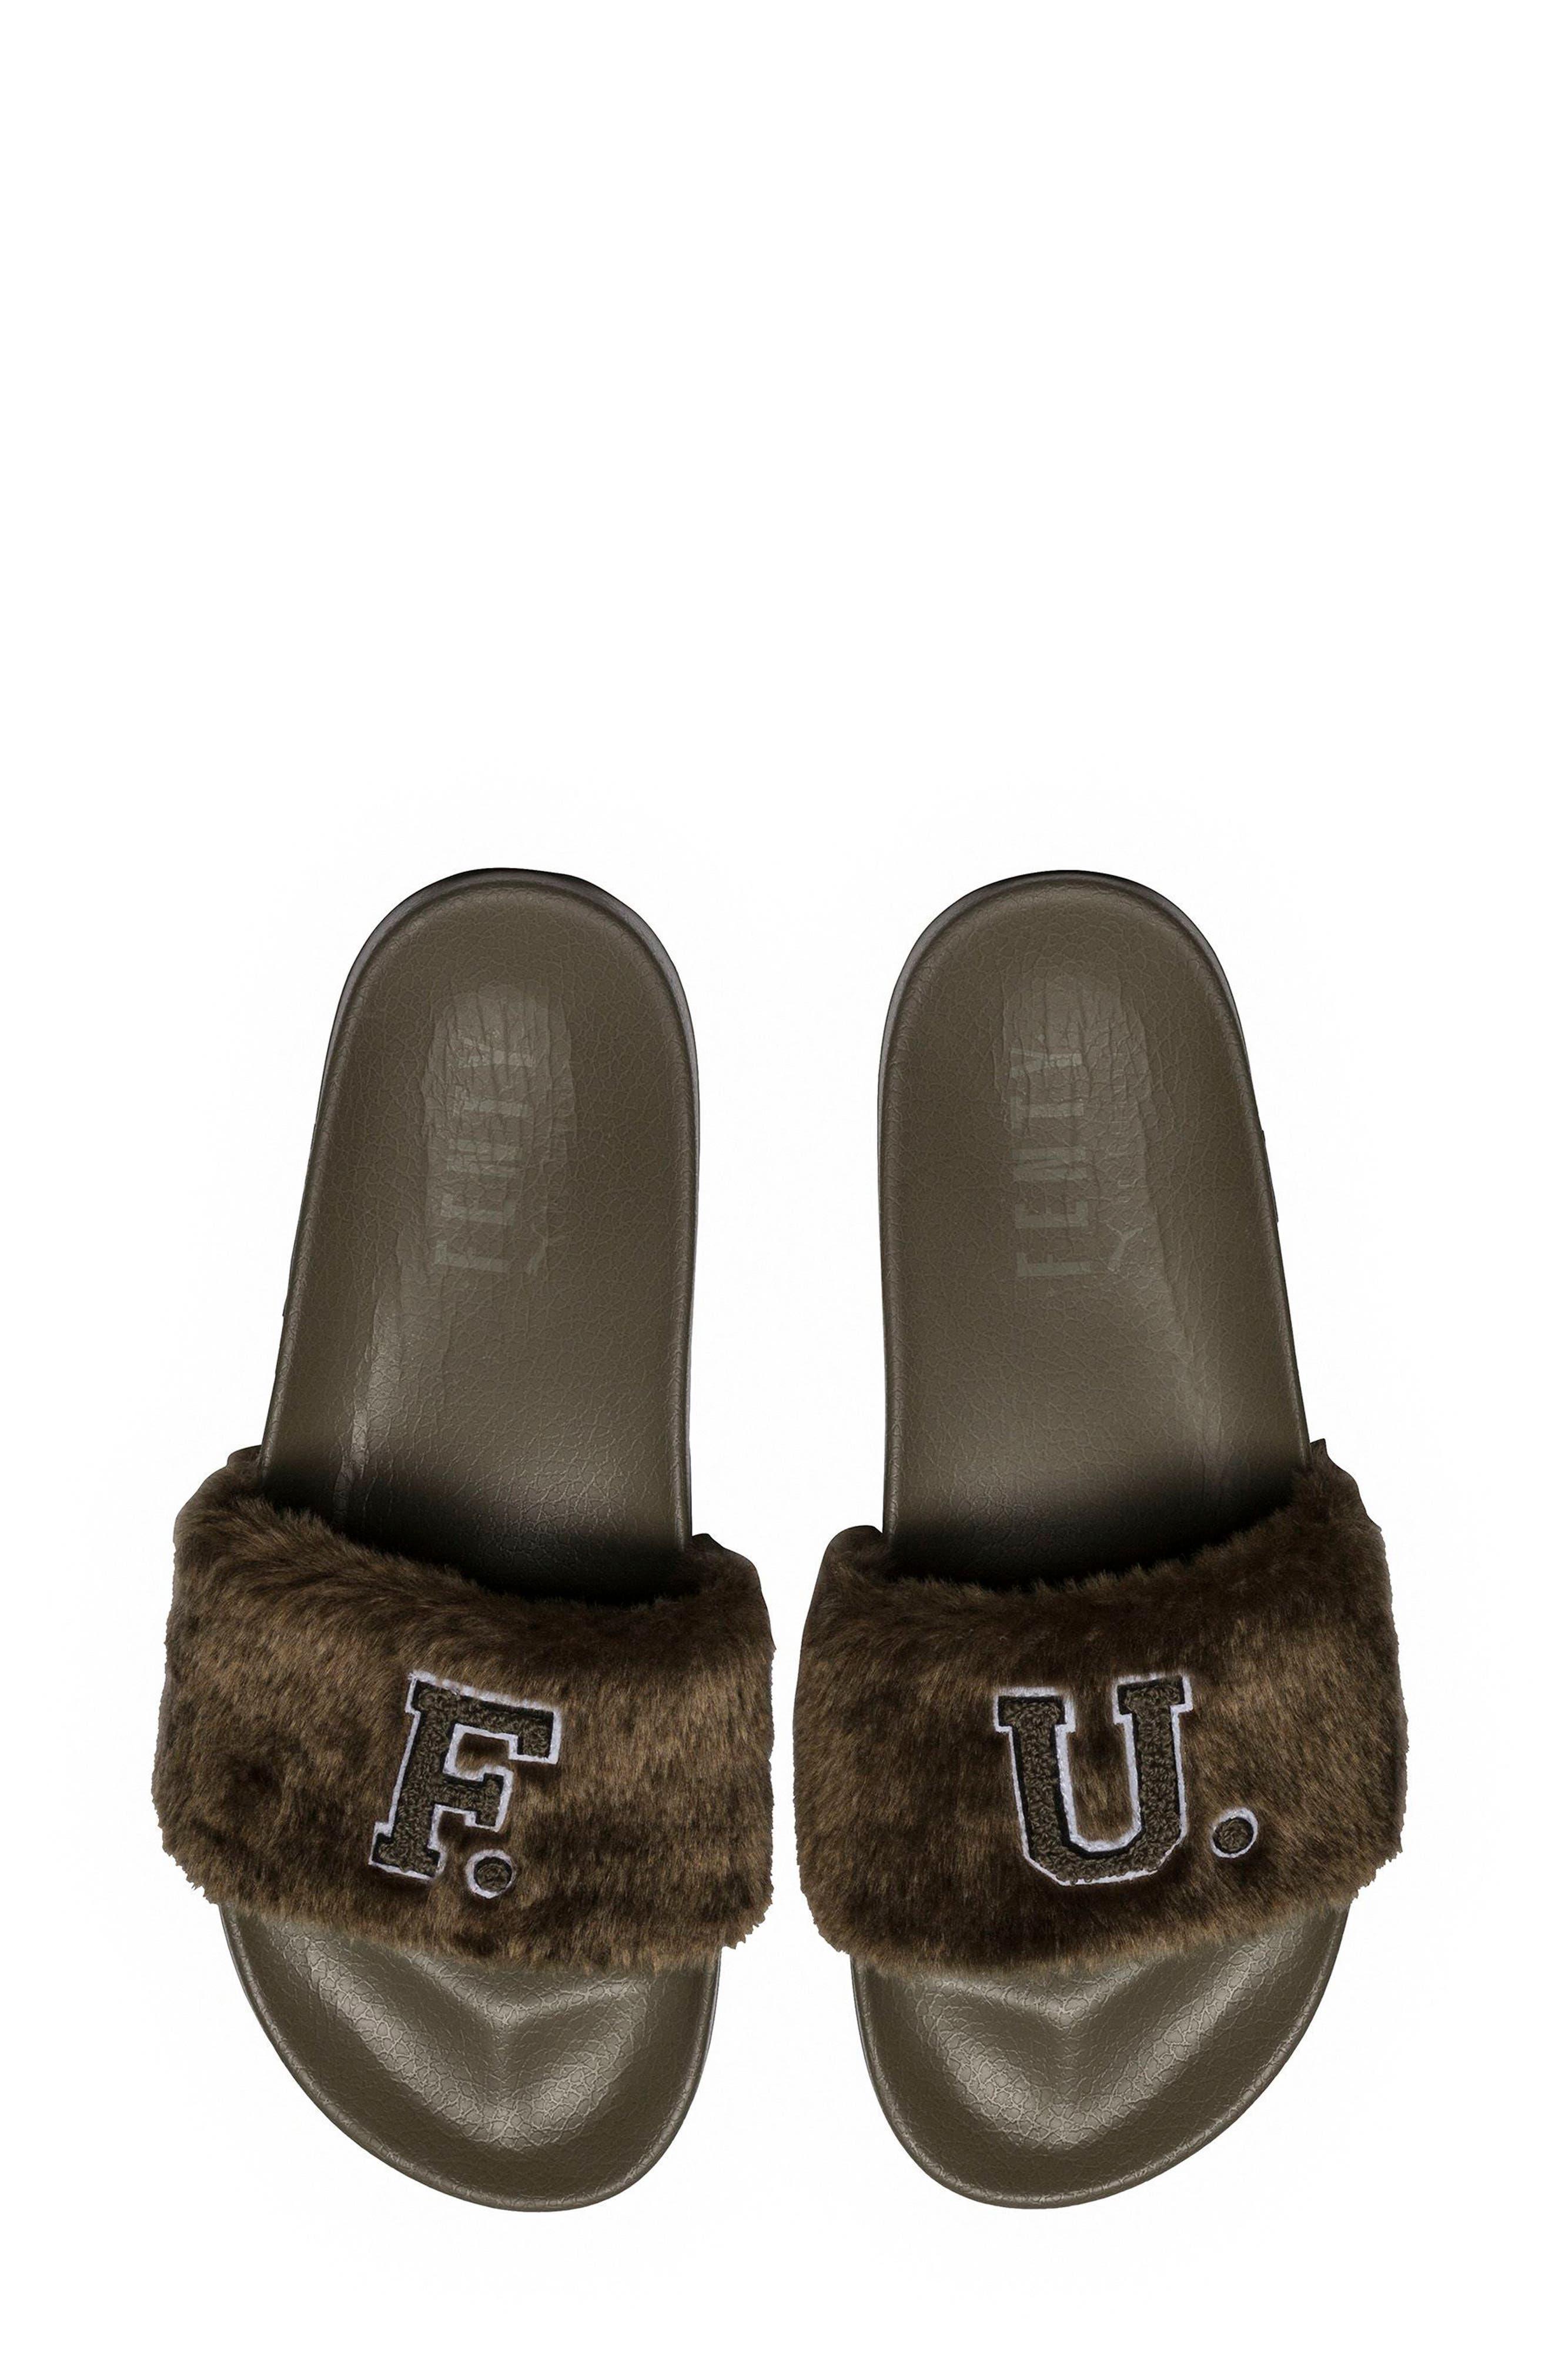 FENTY PUMA by Rihanna Lead Cat Slide Sandals (Women)